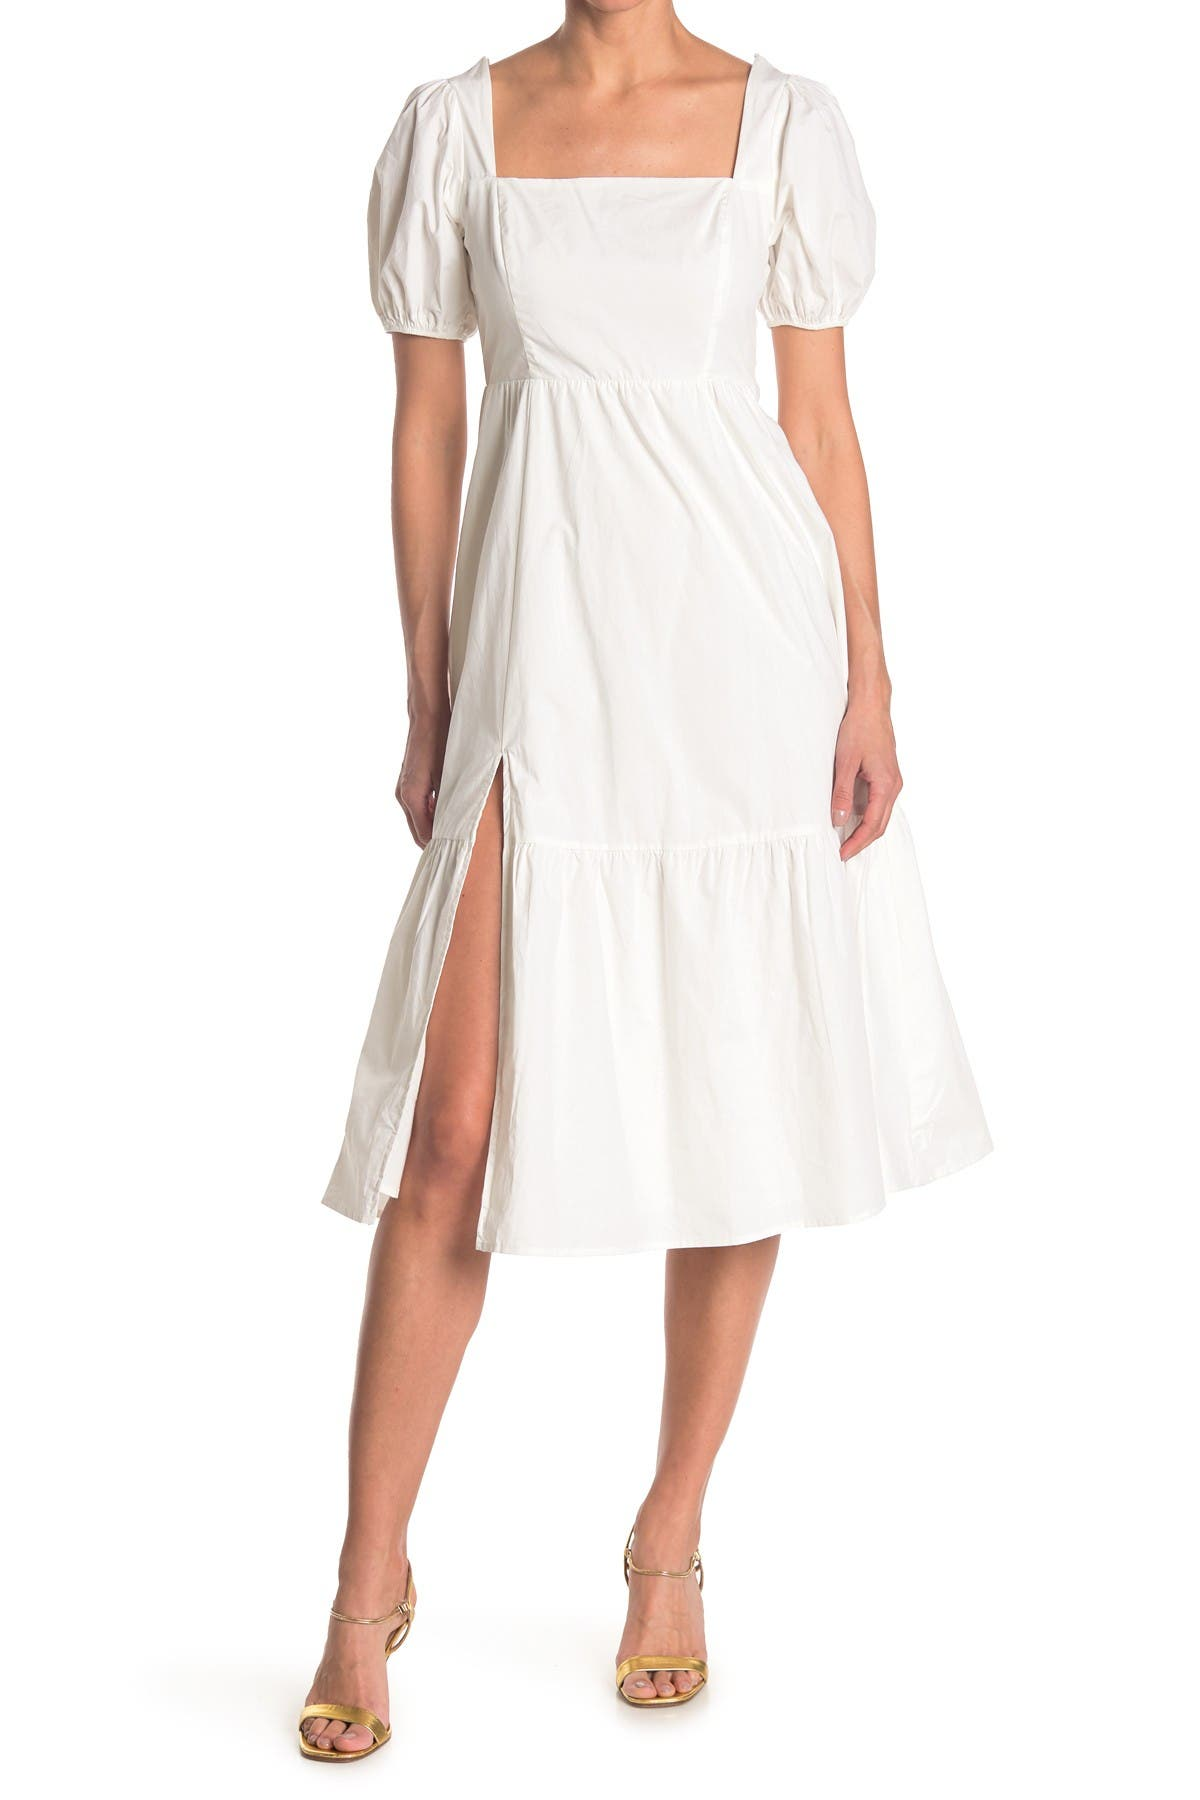 Image of ASTR the Label Poplin Tiered Maxi Dress